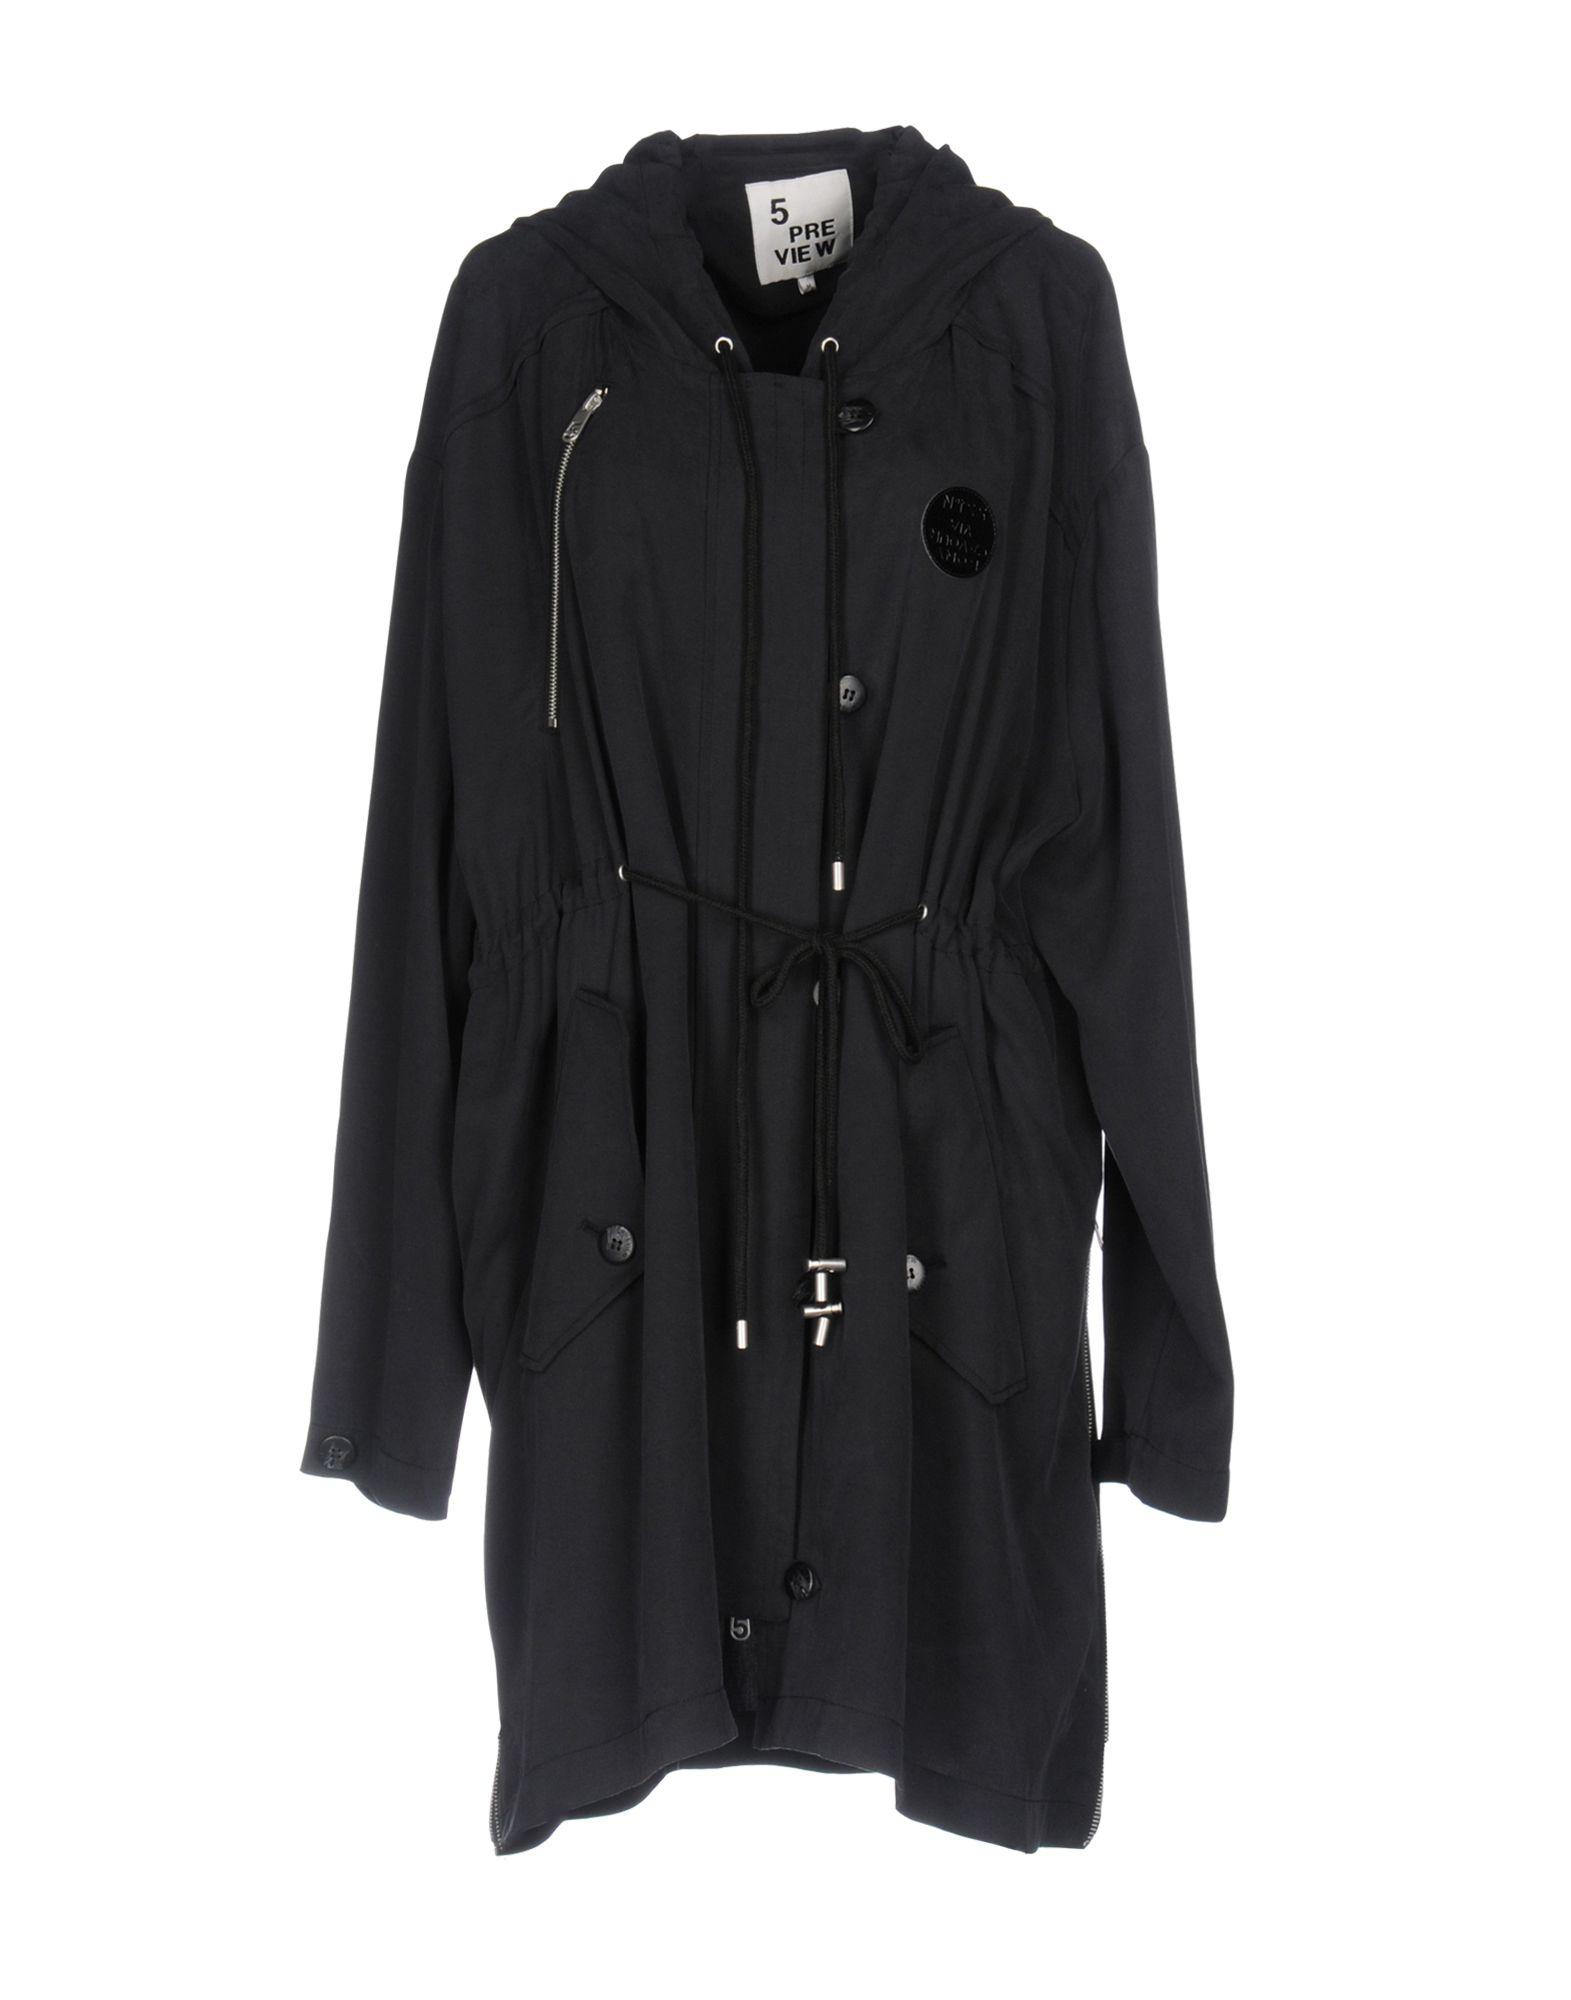 ФОТО 5preview легкое пальто